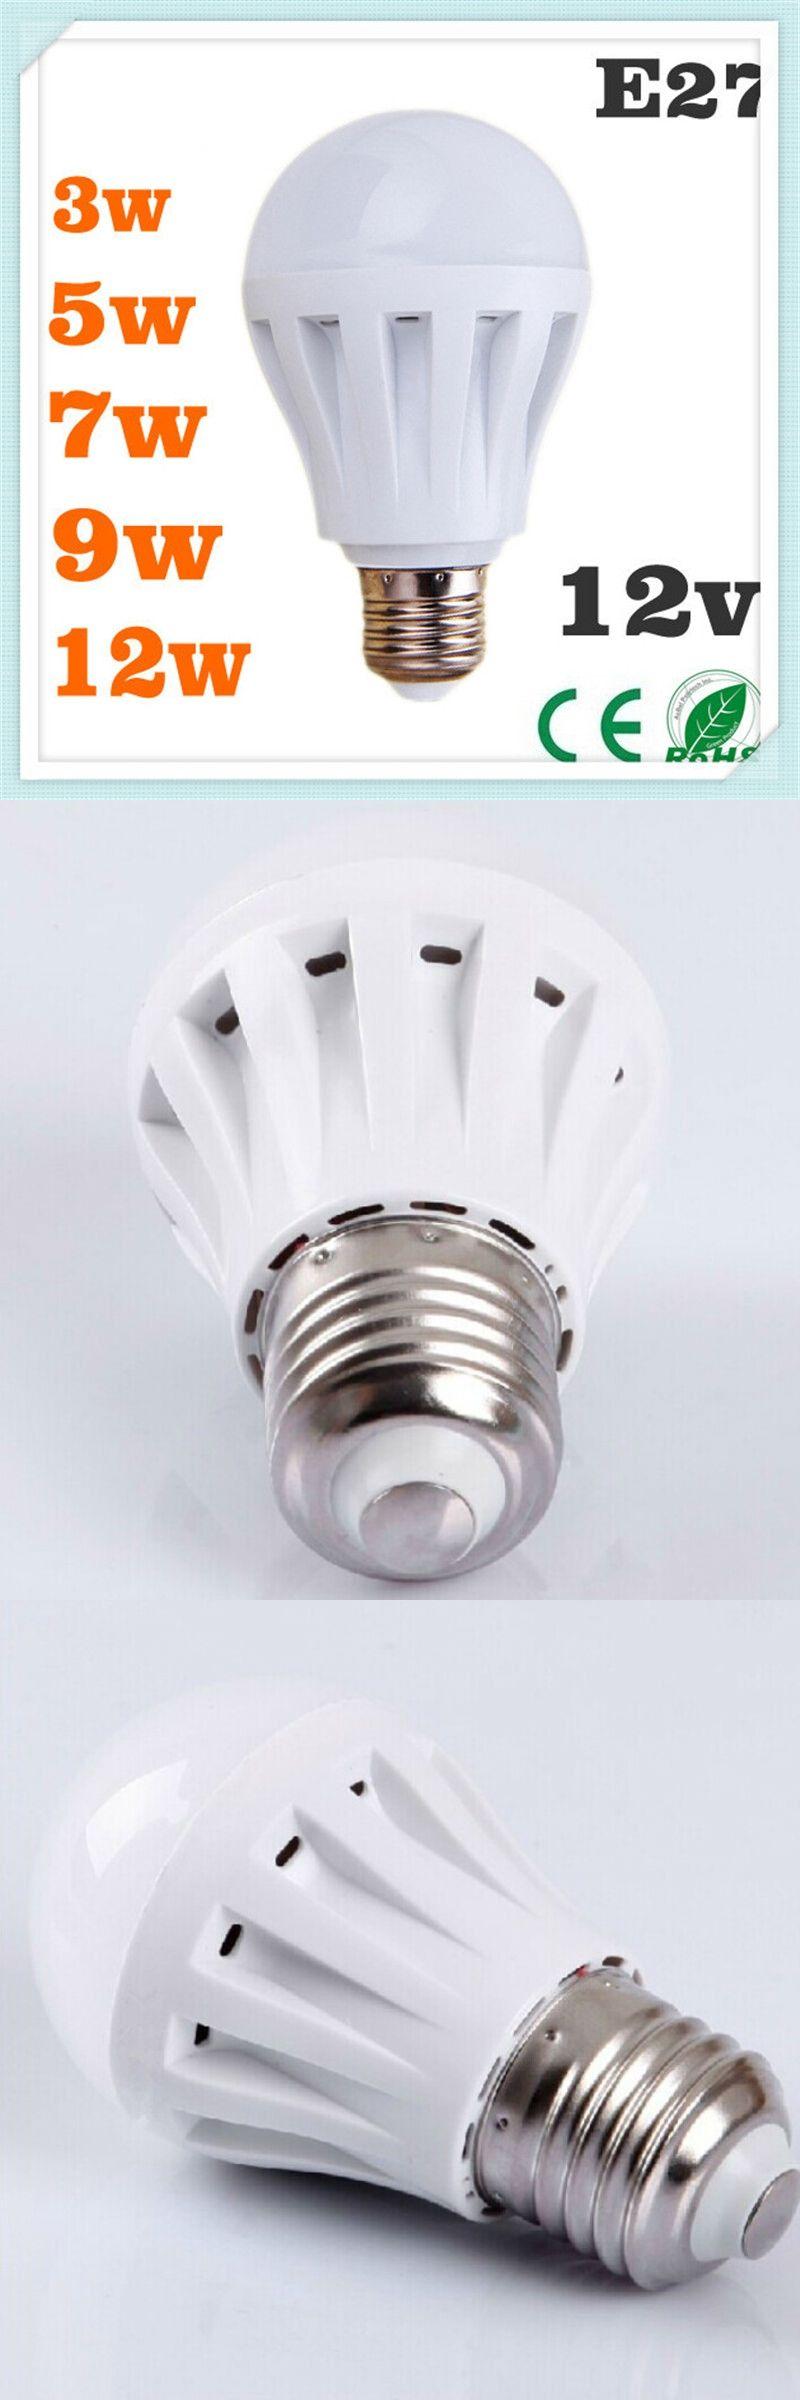 LED Bulb E27 3W 5W 7W 9W 12W LED Spot Light 12V Cold White Warm ...